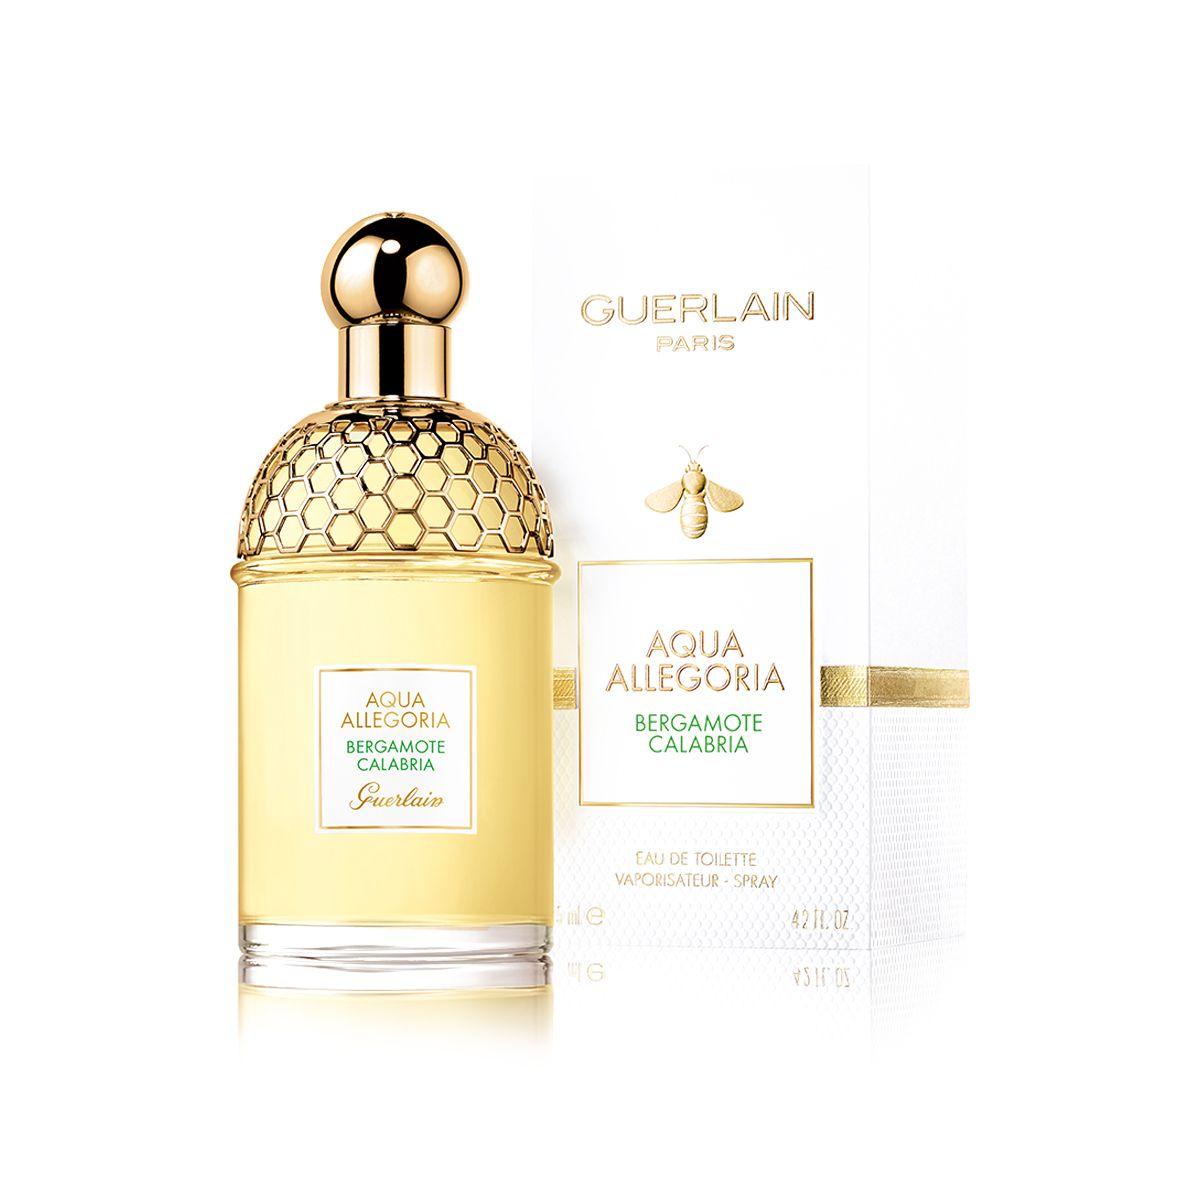 FREE Guerlain Aqua Allegoria Perfume | Free samples uk ...